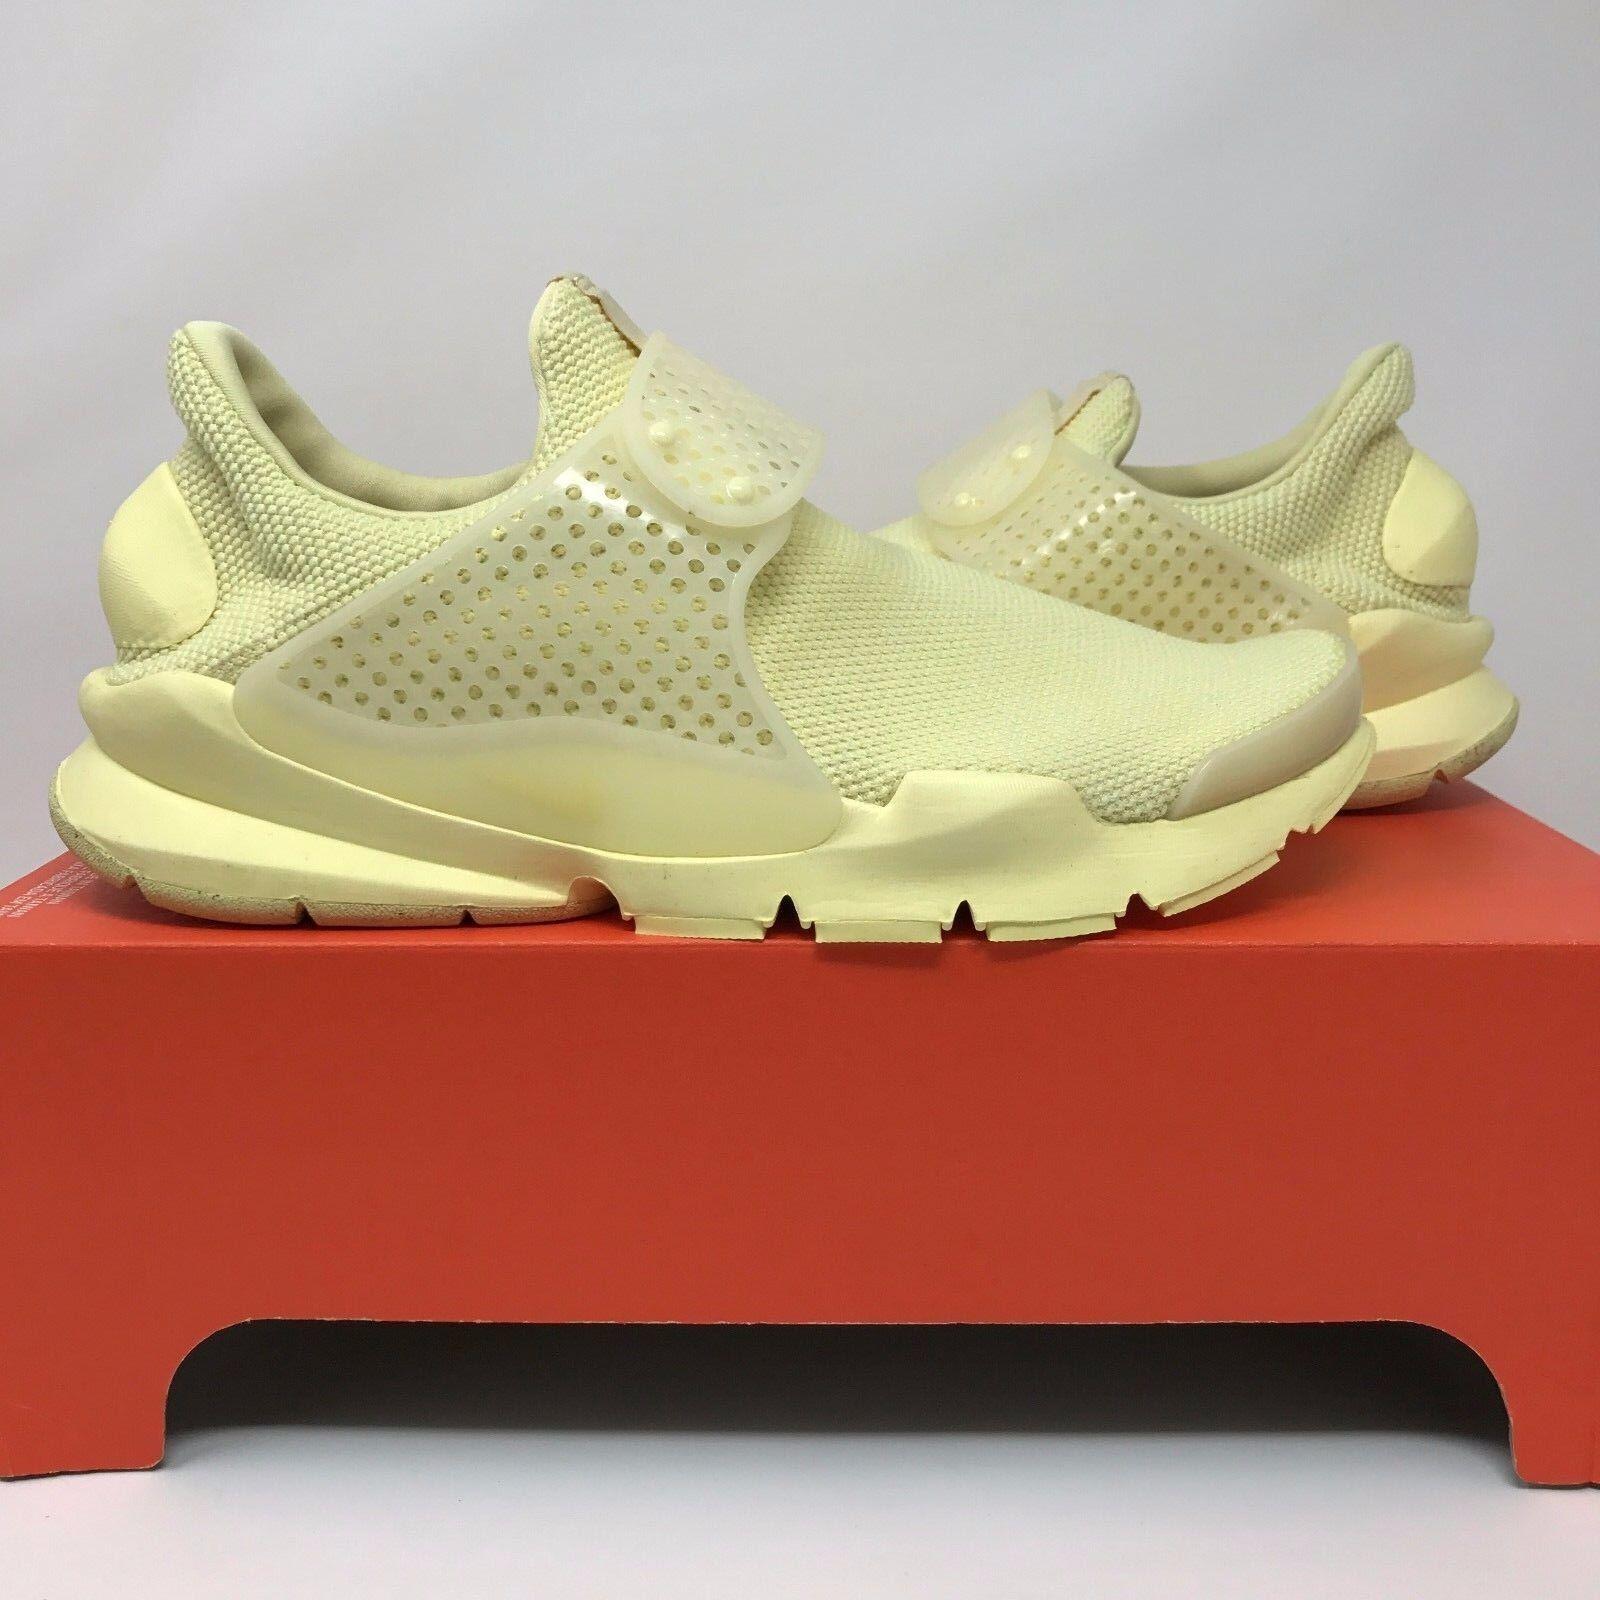 Nike Sock Dart Breathe Lemon Chiffon 909551-700 - BR Presto Flyknit NMD Boost OG Cheap and beautiful fashion Great discount